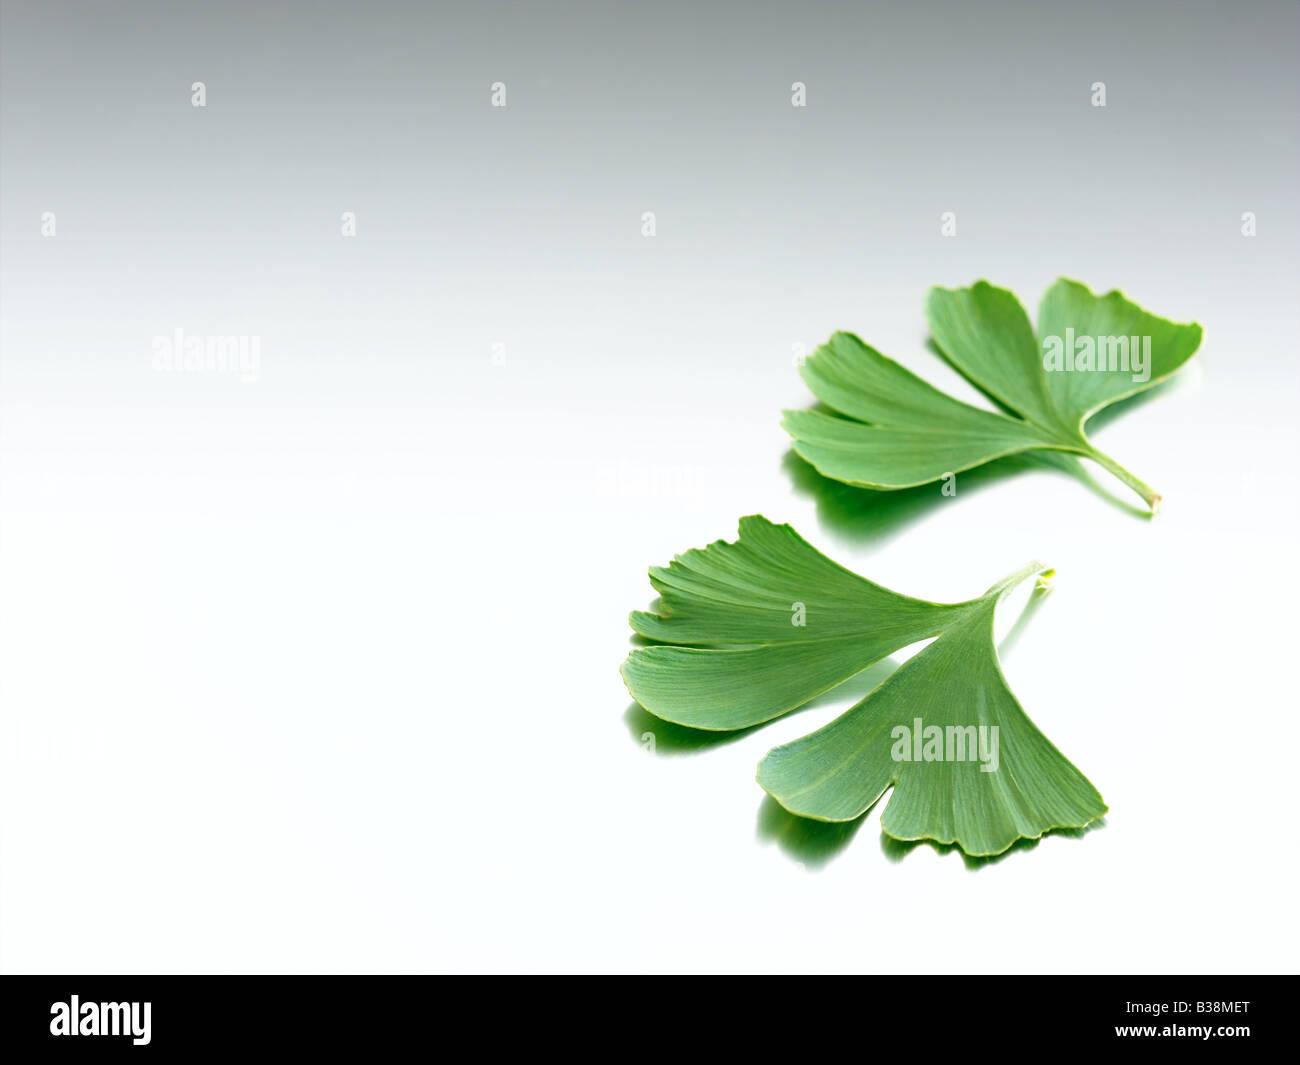 ginkgo - Stock Image